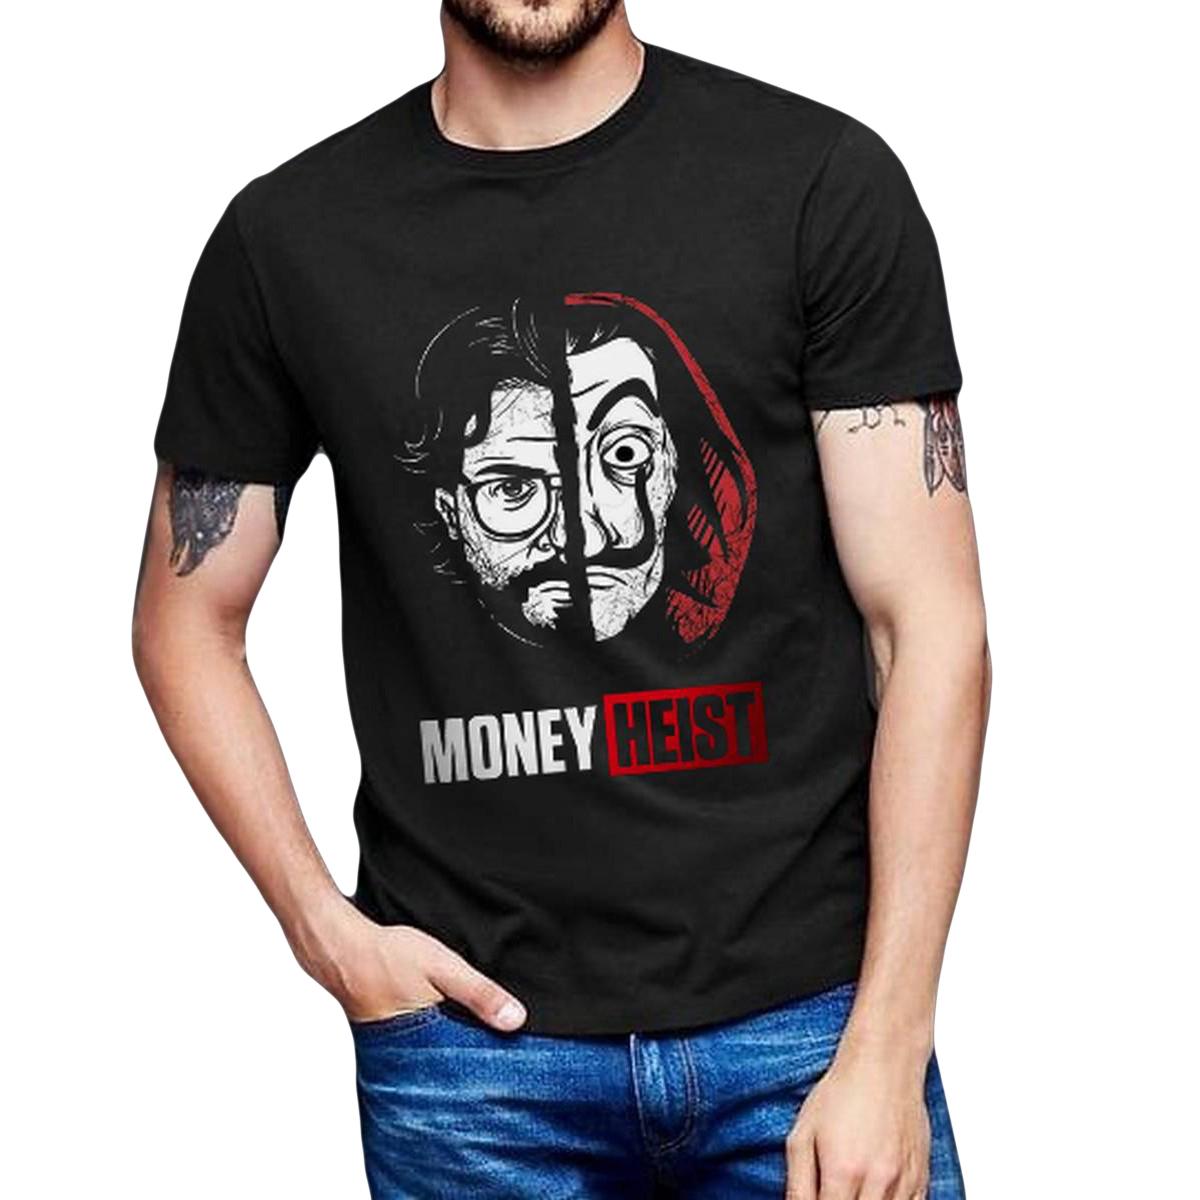 Money Heist Printed Summer T Shirts for Men